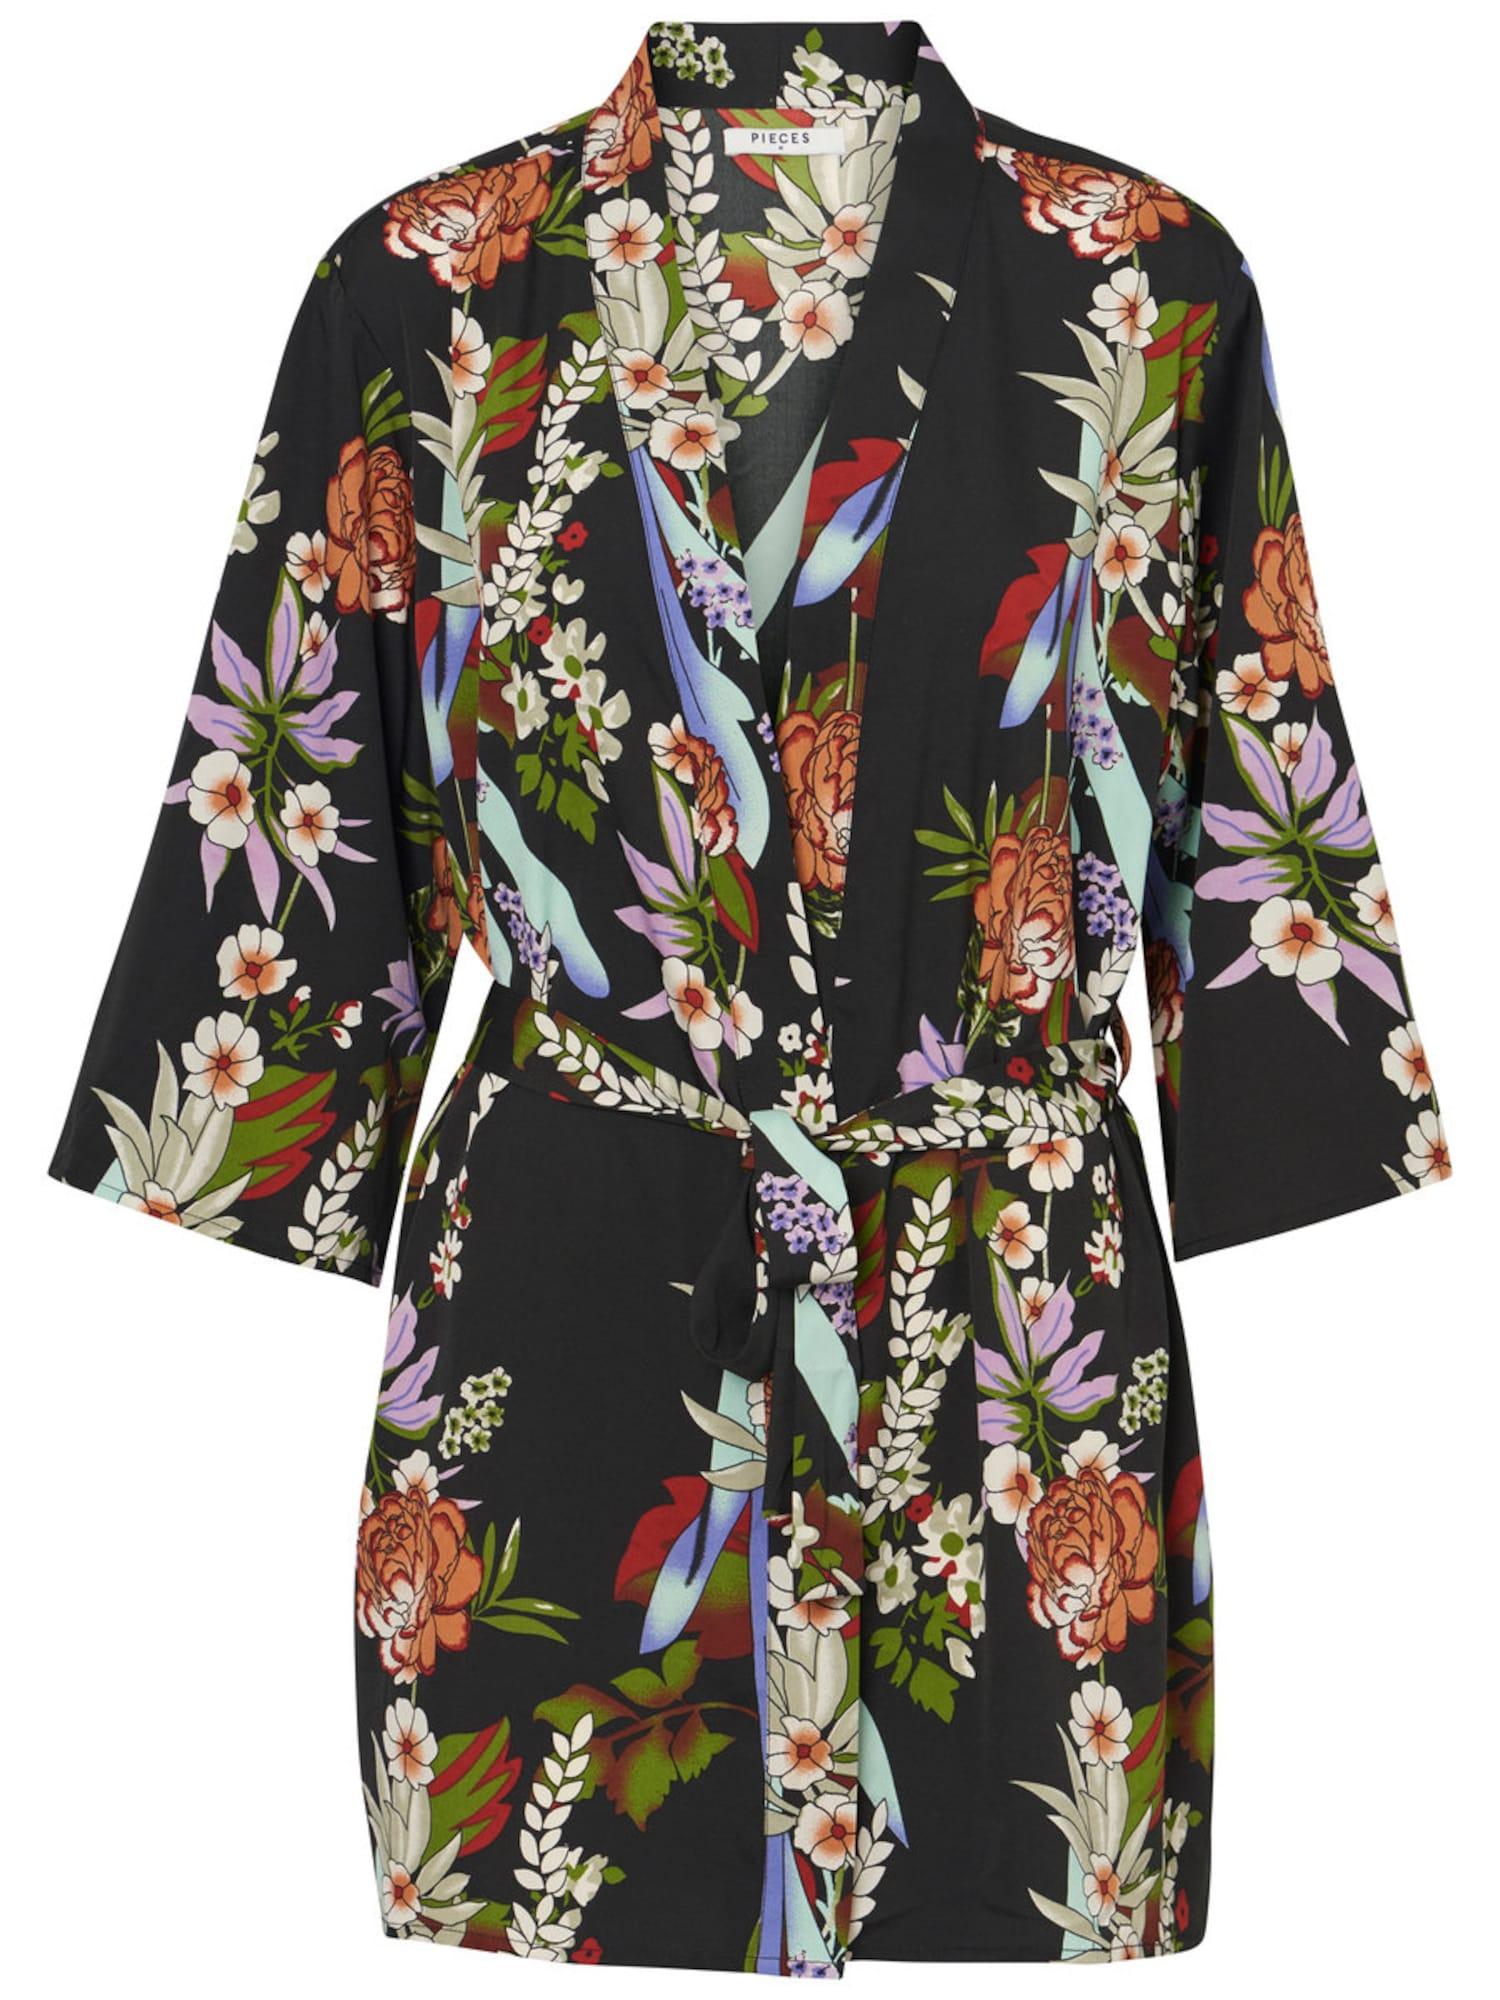 PIECES Bedrukte Kimono Dames Zwart